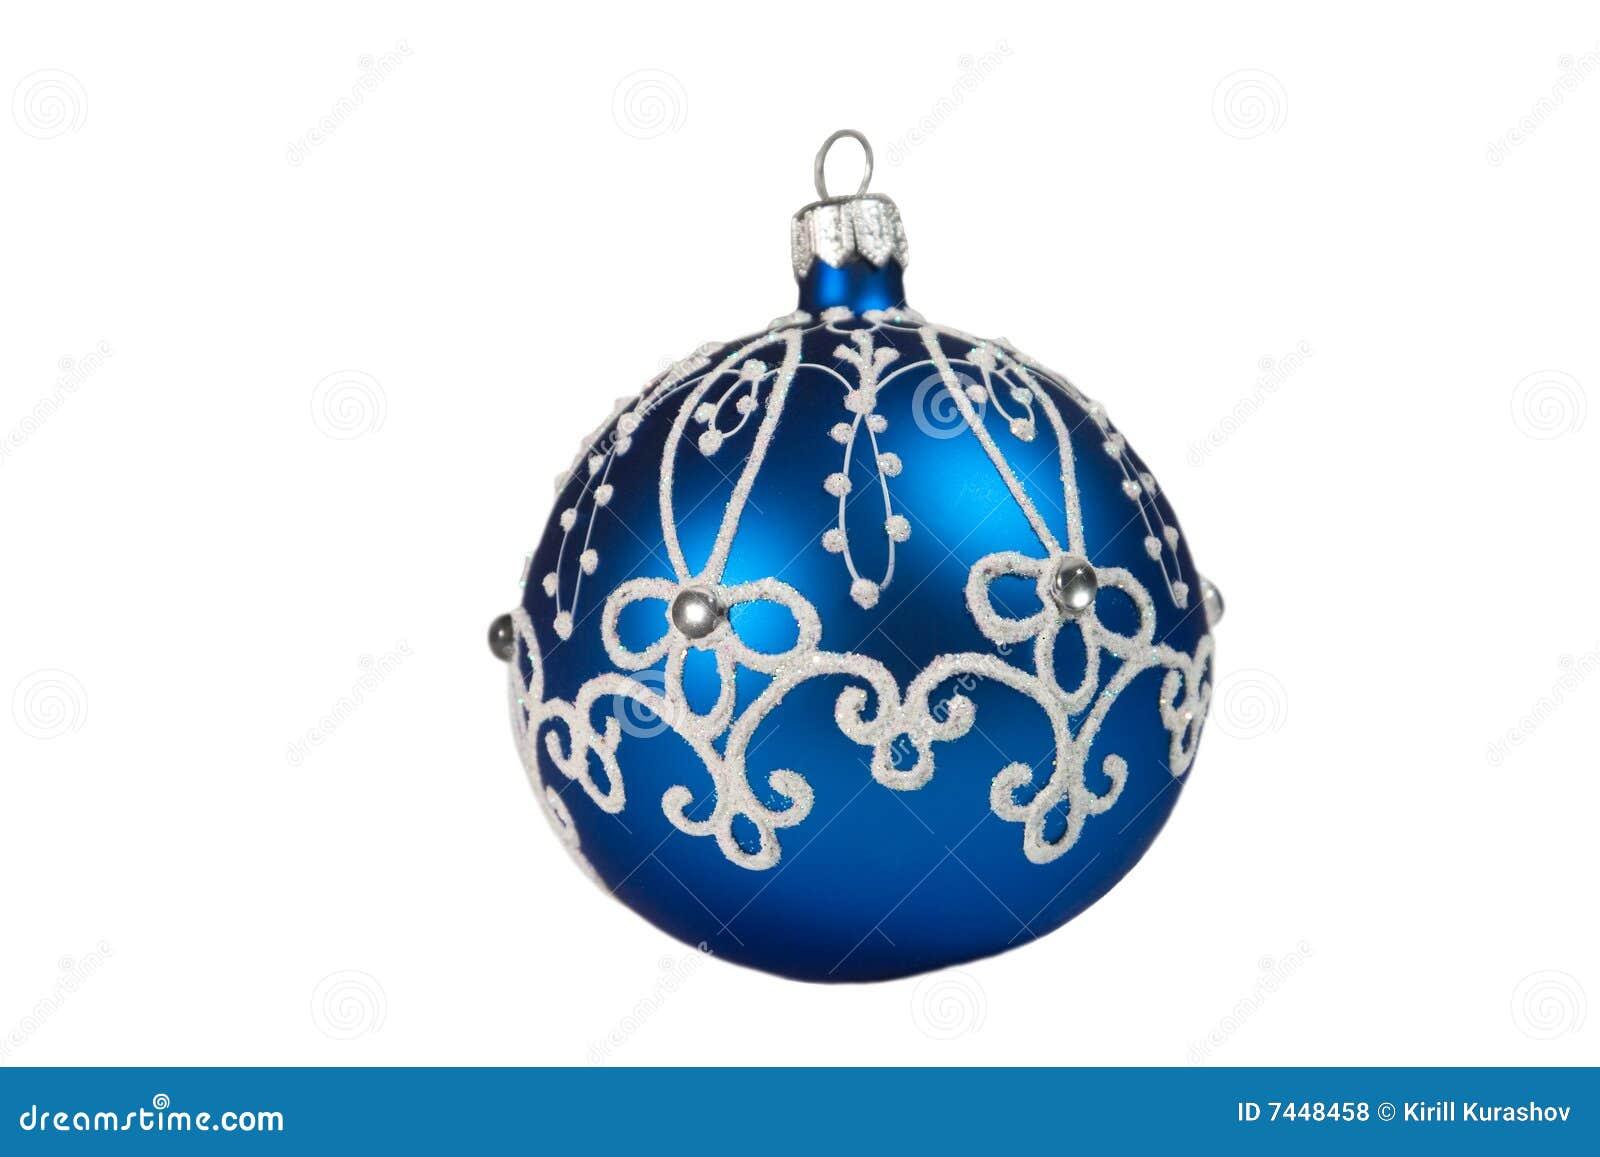 beautiful blue christmas ball royalty free stock photos - Blue Christmas Balls